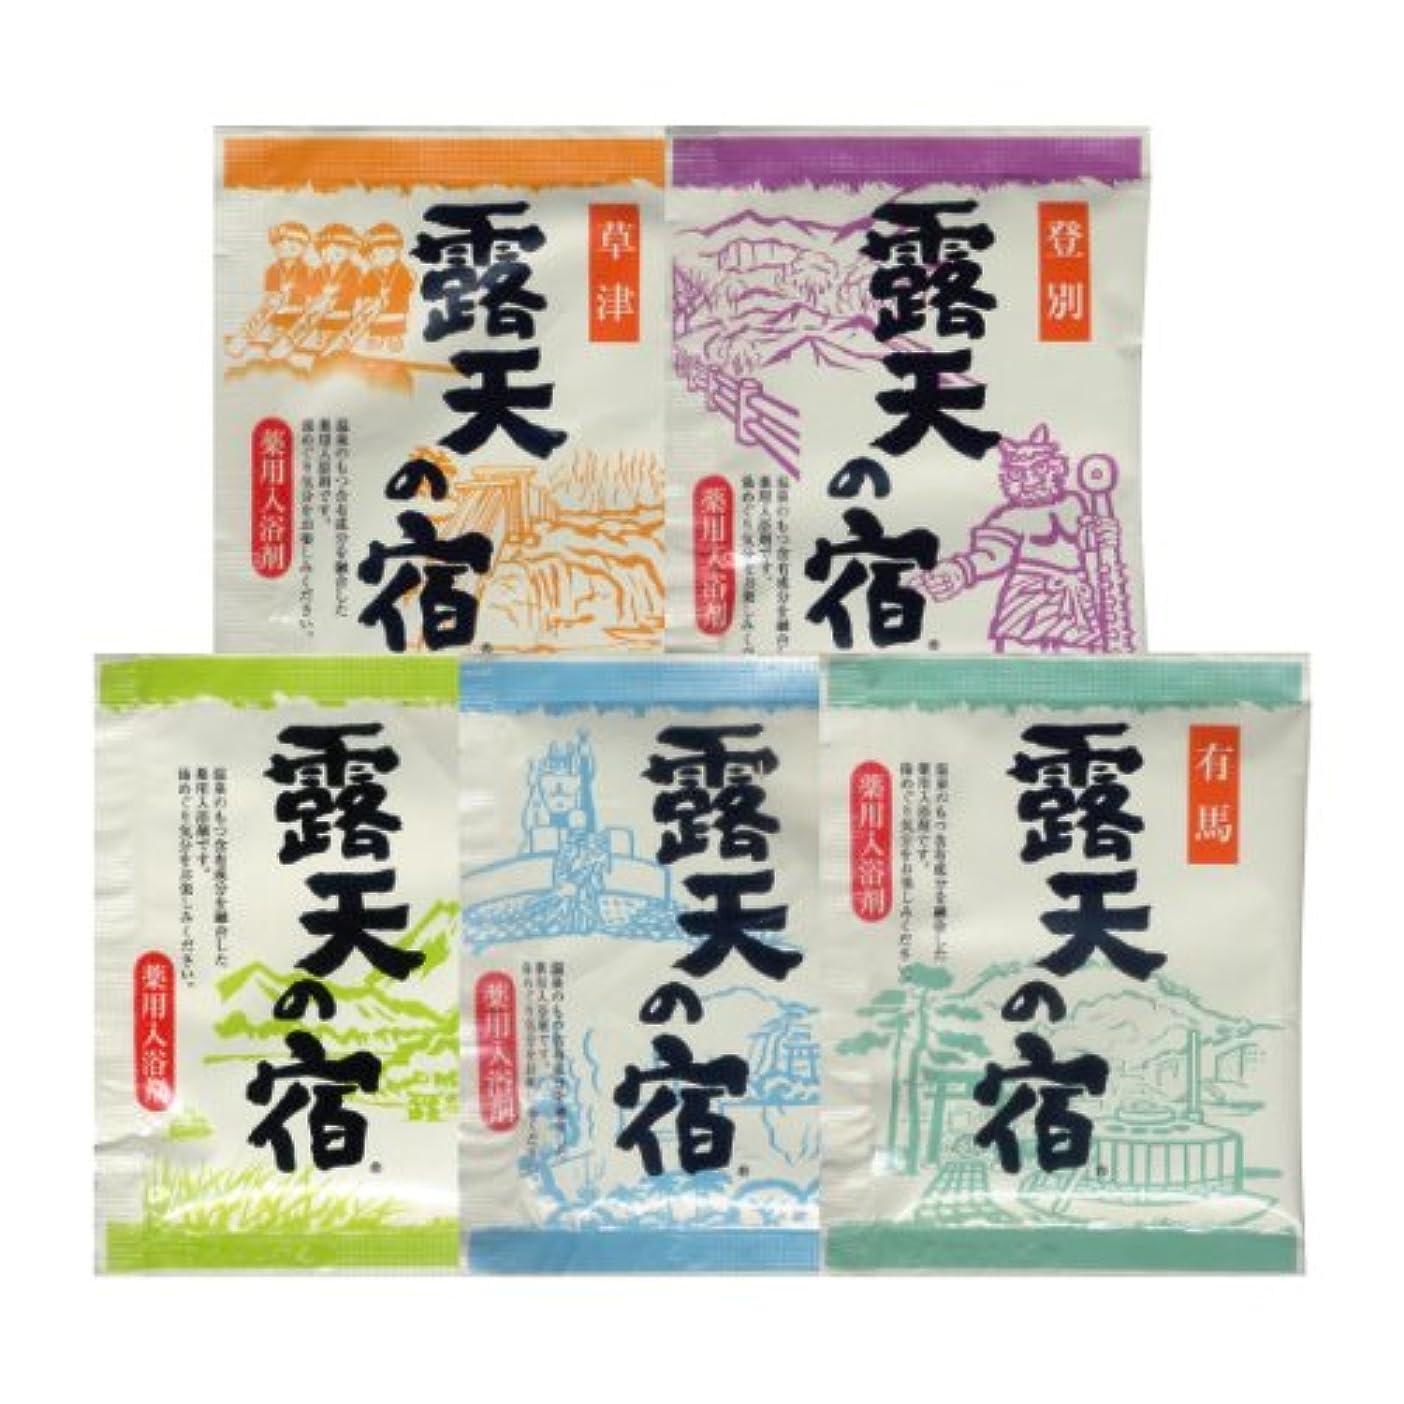 豆腐原理戦艦薬用入浴剤 露天の宿 5種アソート100包